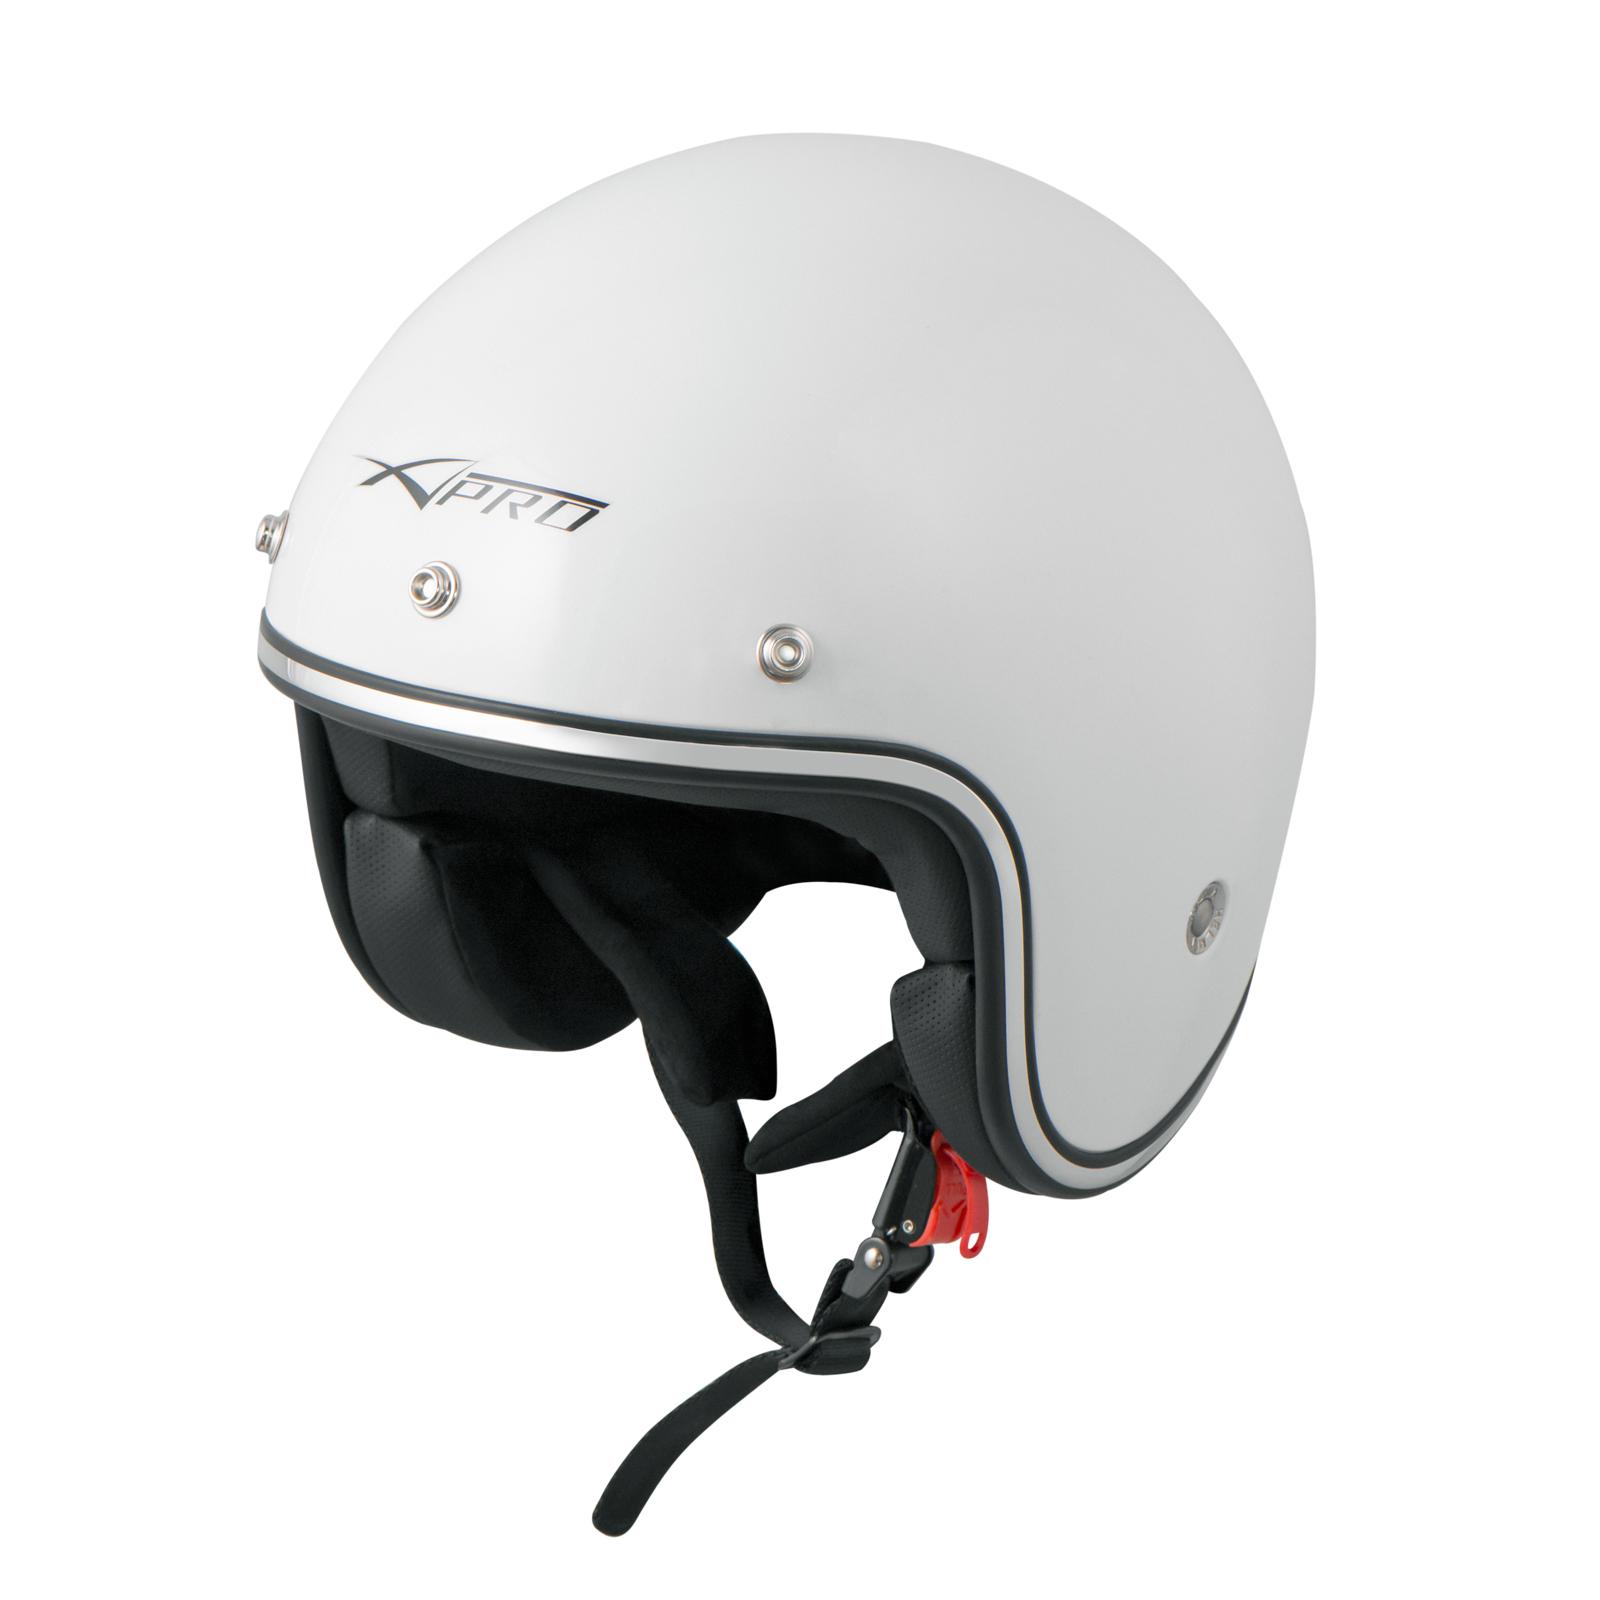 Casque-Moto-Jet-Kustom-Demi-Scooter-ECE-22-05-approbation miniature 18